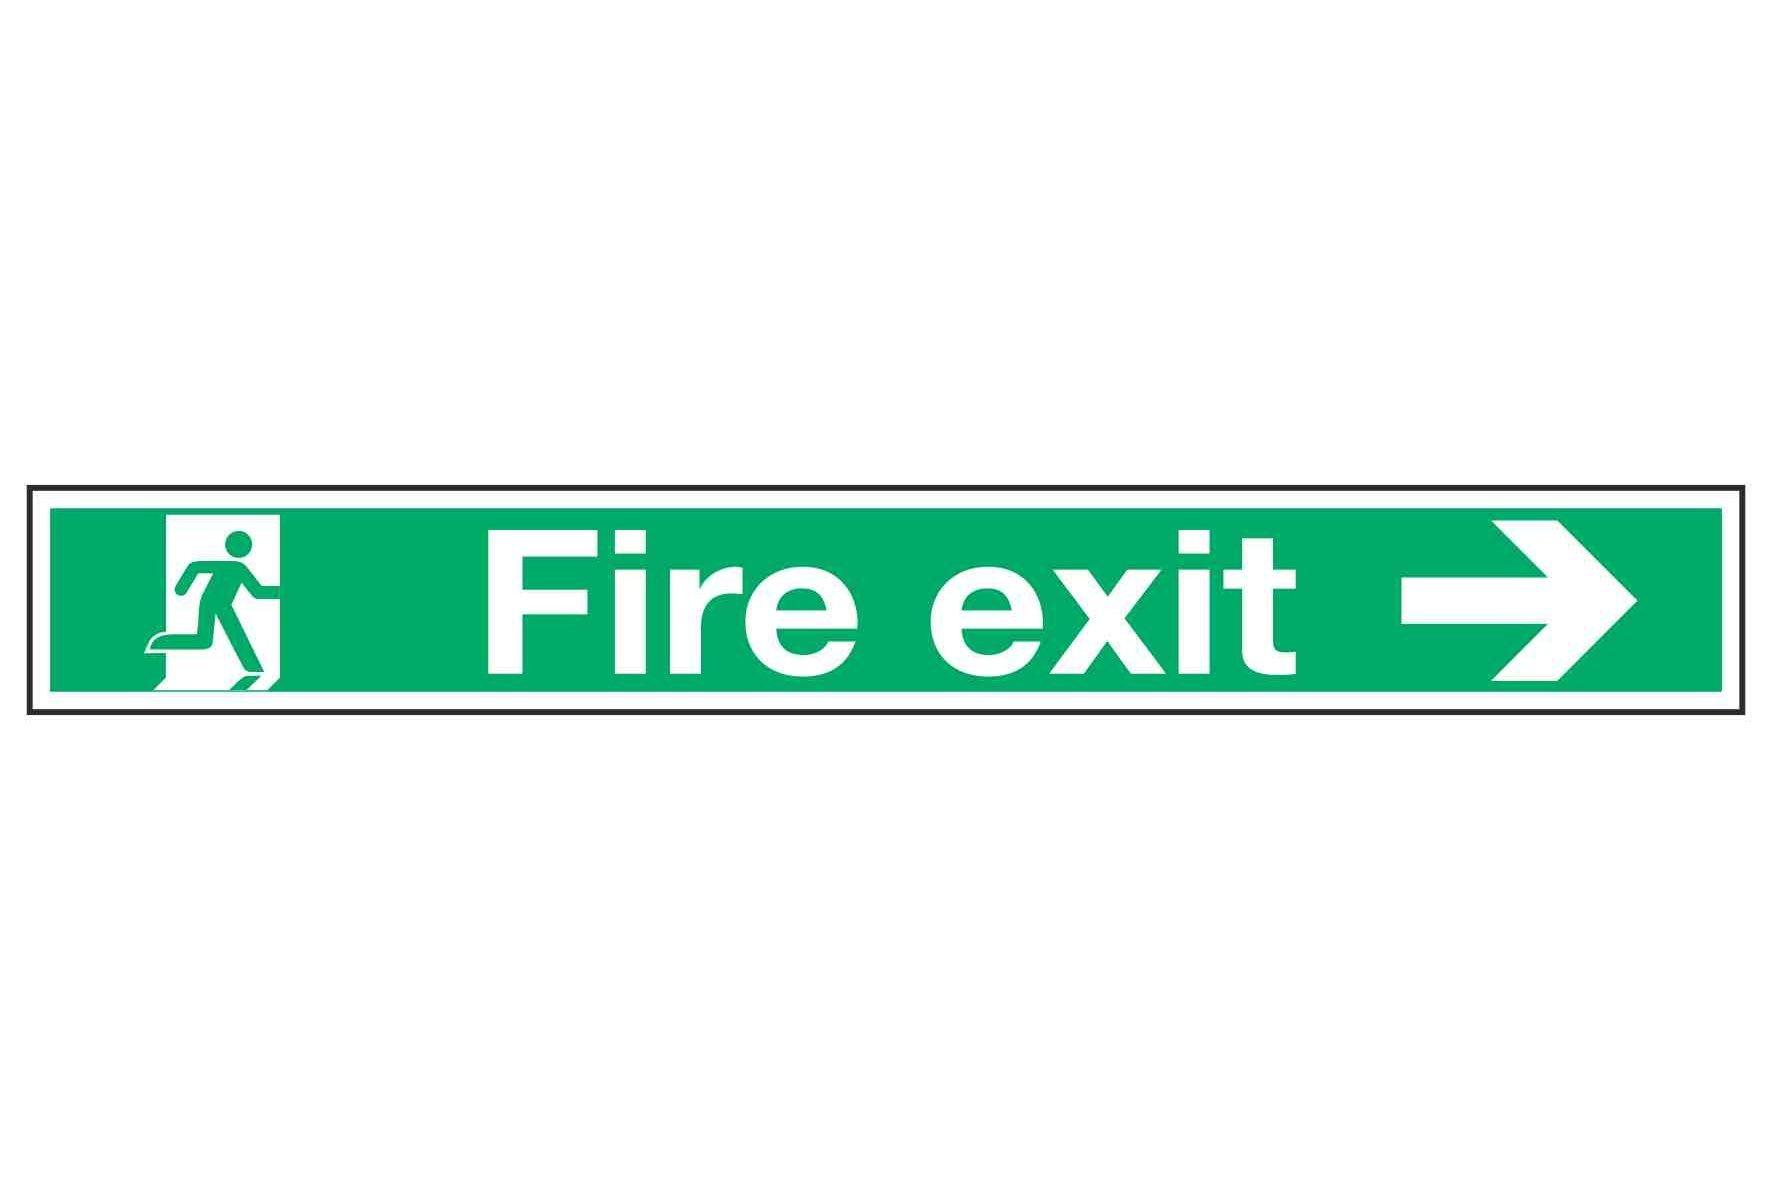 Fire exit / Arrow Right 750mm x 150mm